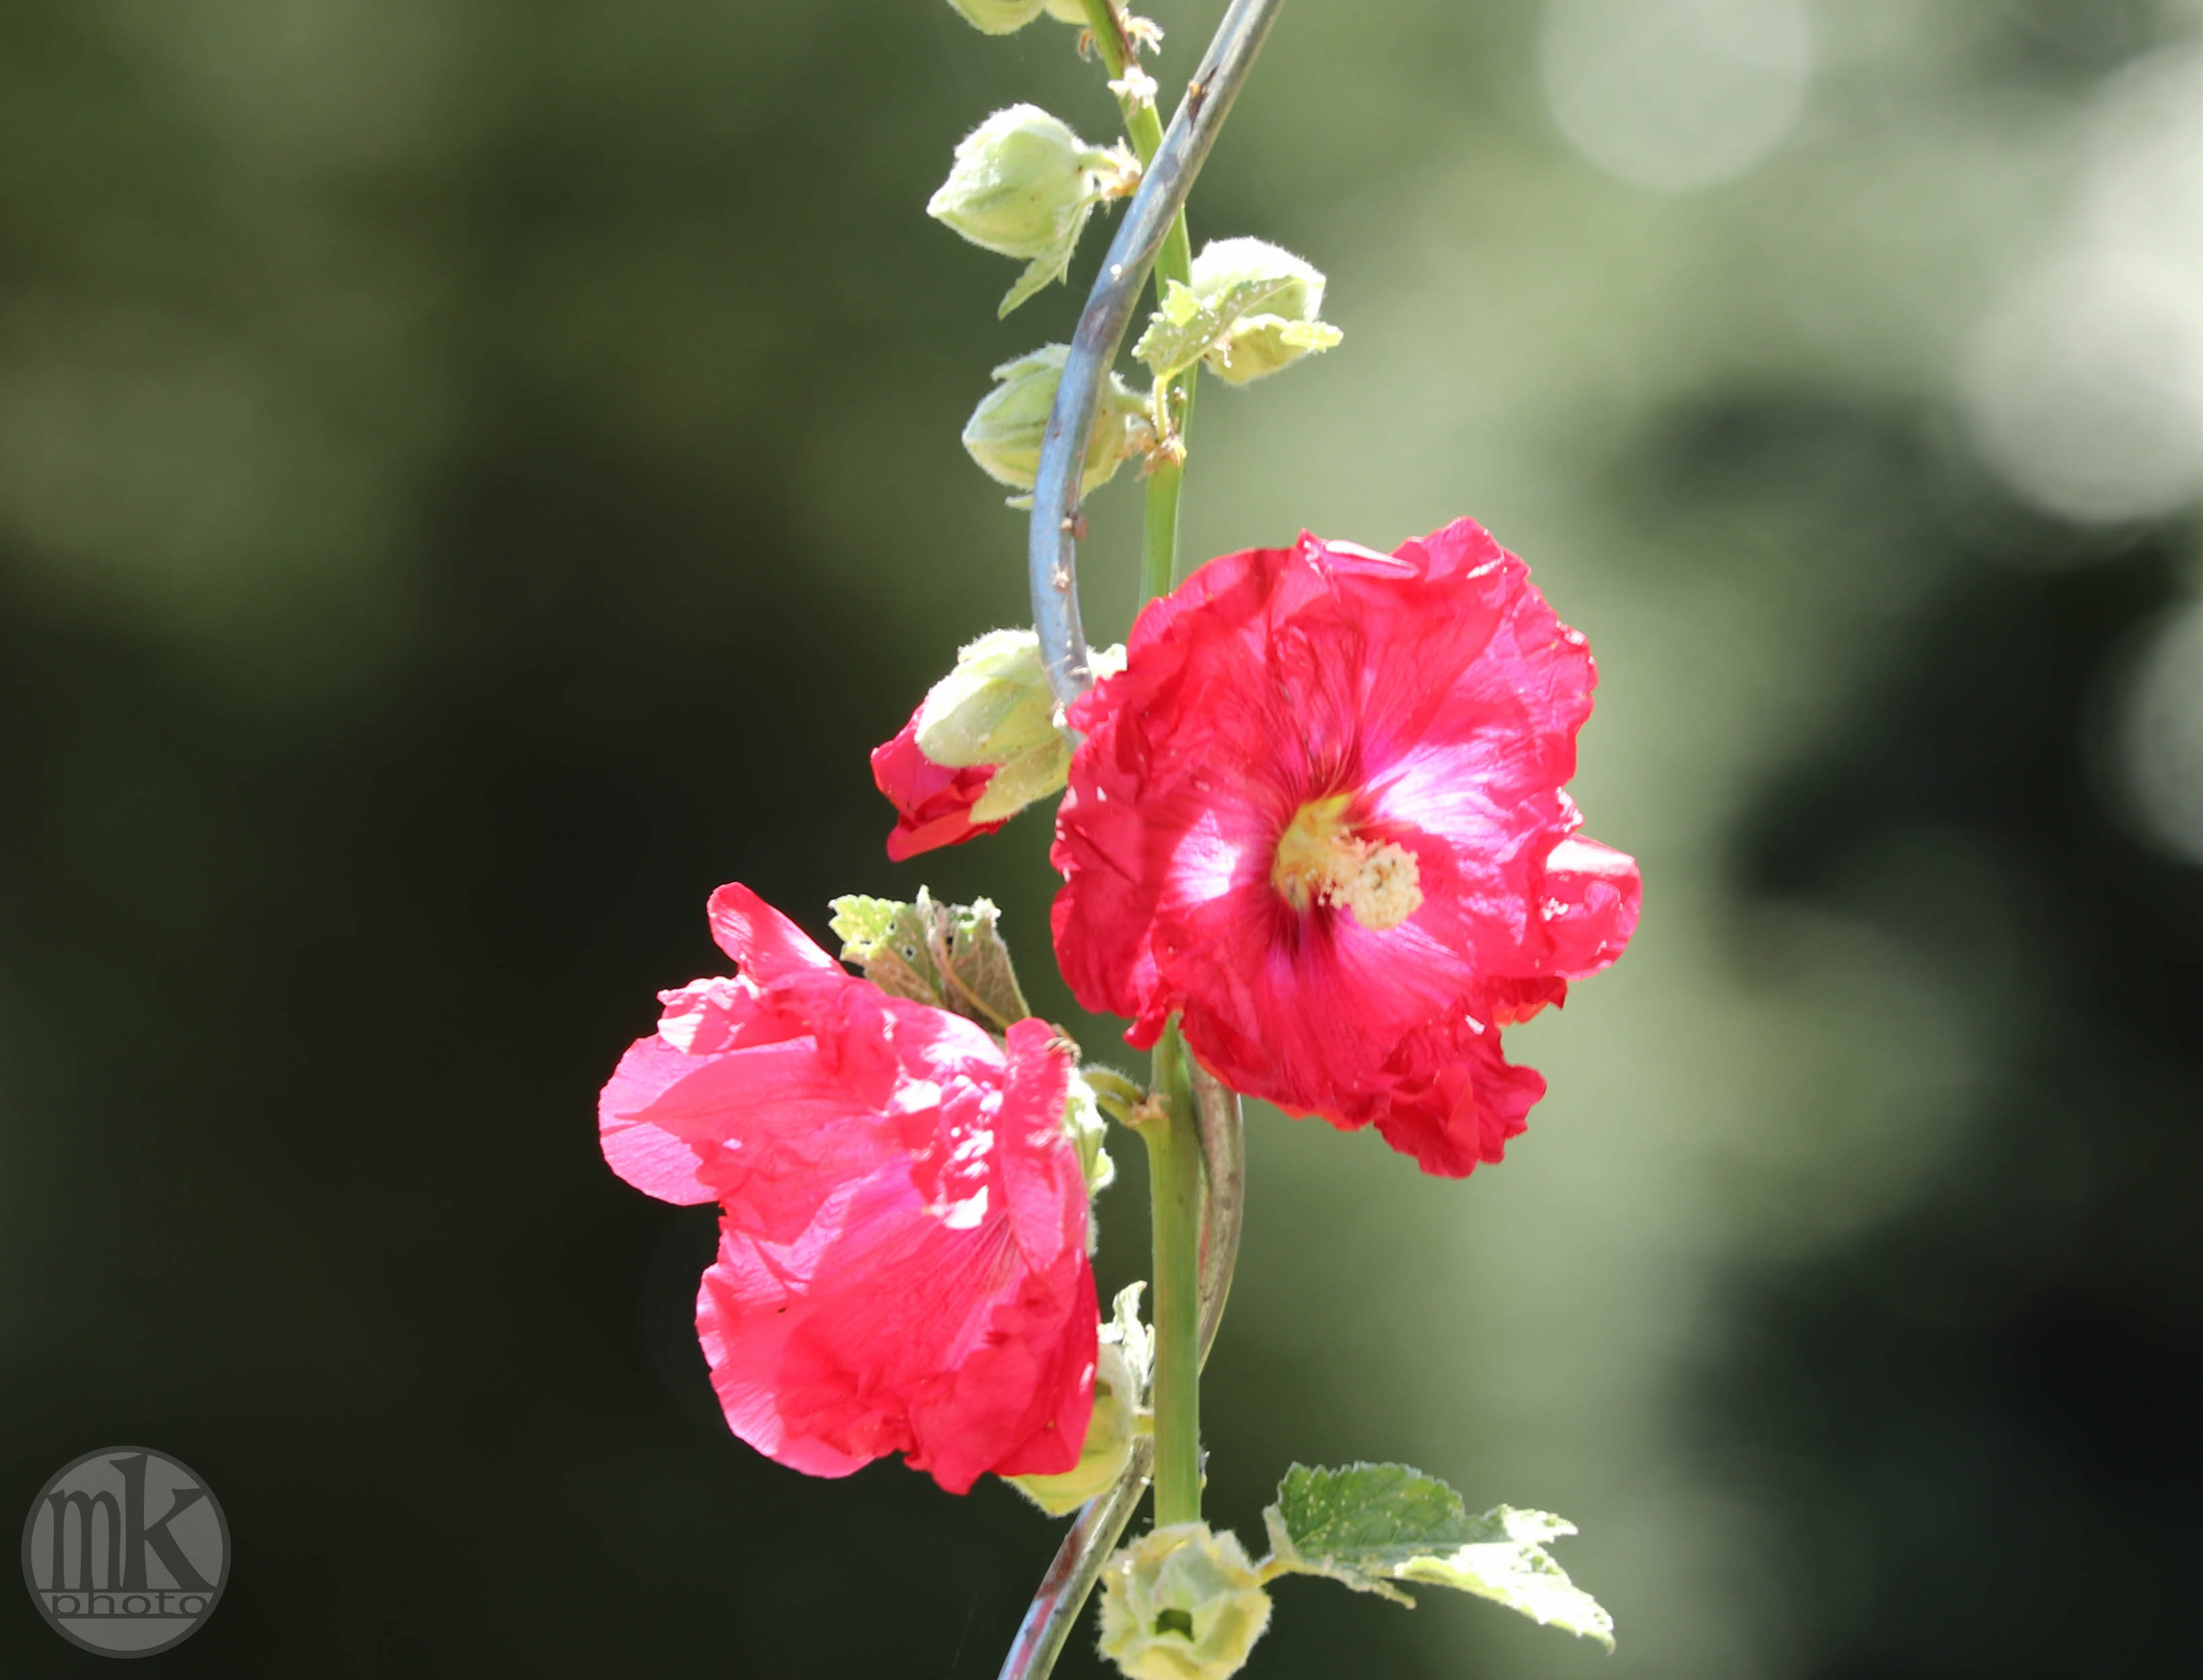 rose trémière, Keranlay, 21 juin 20, 14h56